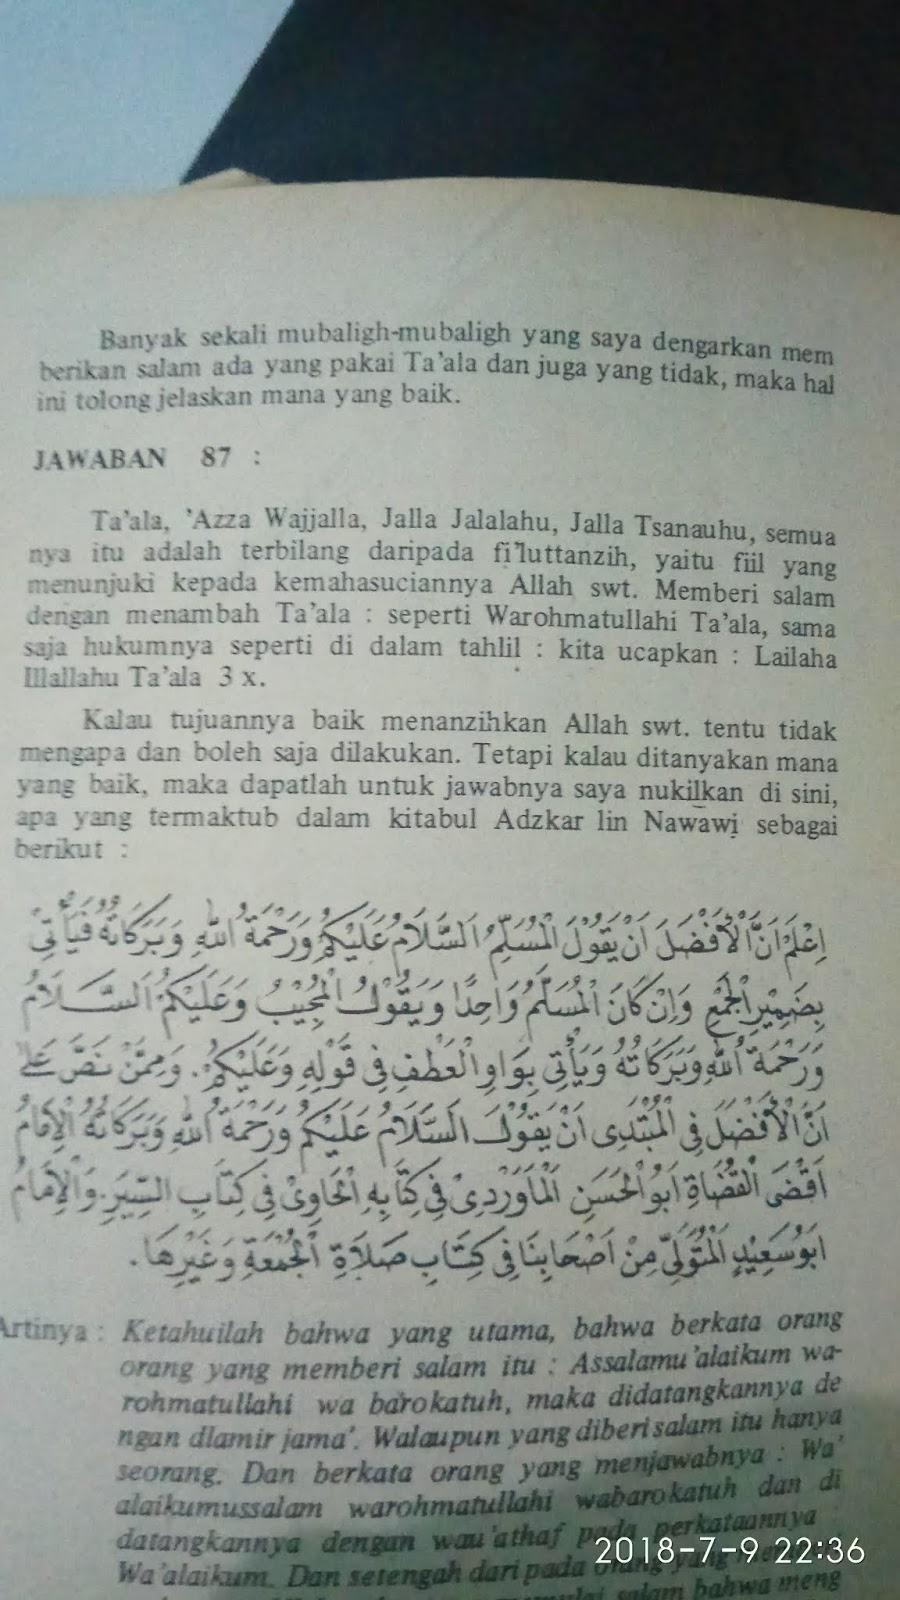 Tulisan Salam Yang Benar : tulisan, salam, benar, MENGUCAP, SALAM, DENGAN, MENAMBAH, LAFADZ, TA'ALA,, BAGAIMANA?, Majelis, Al-Ibthon